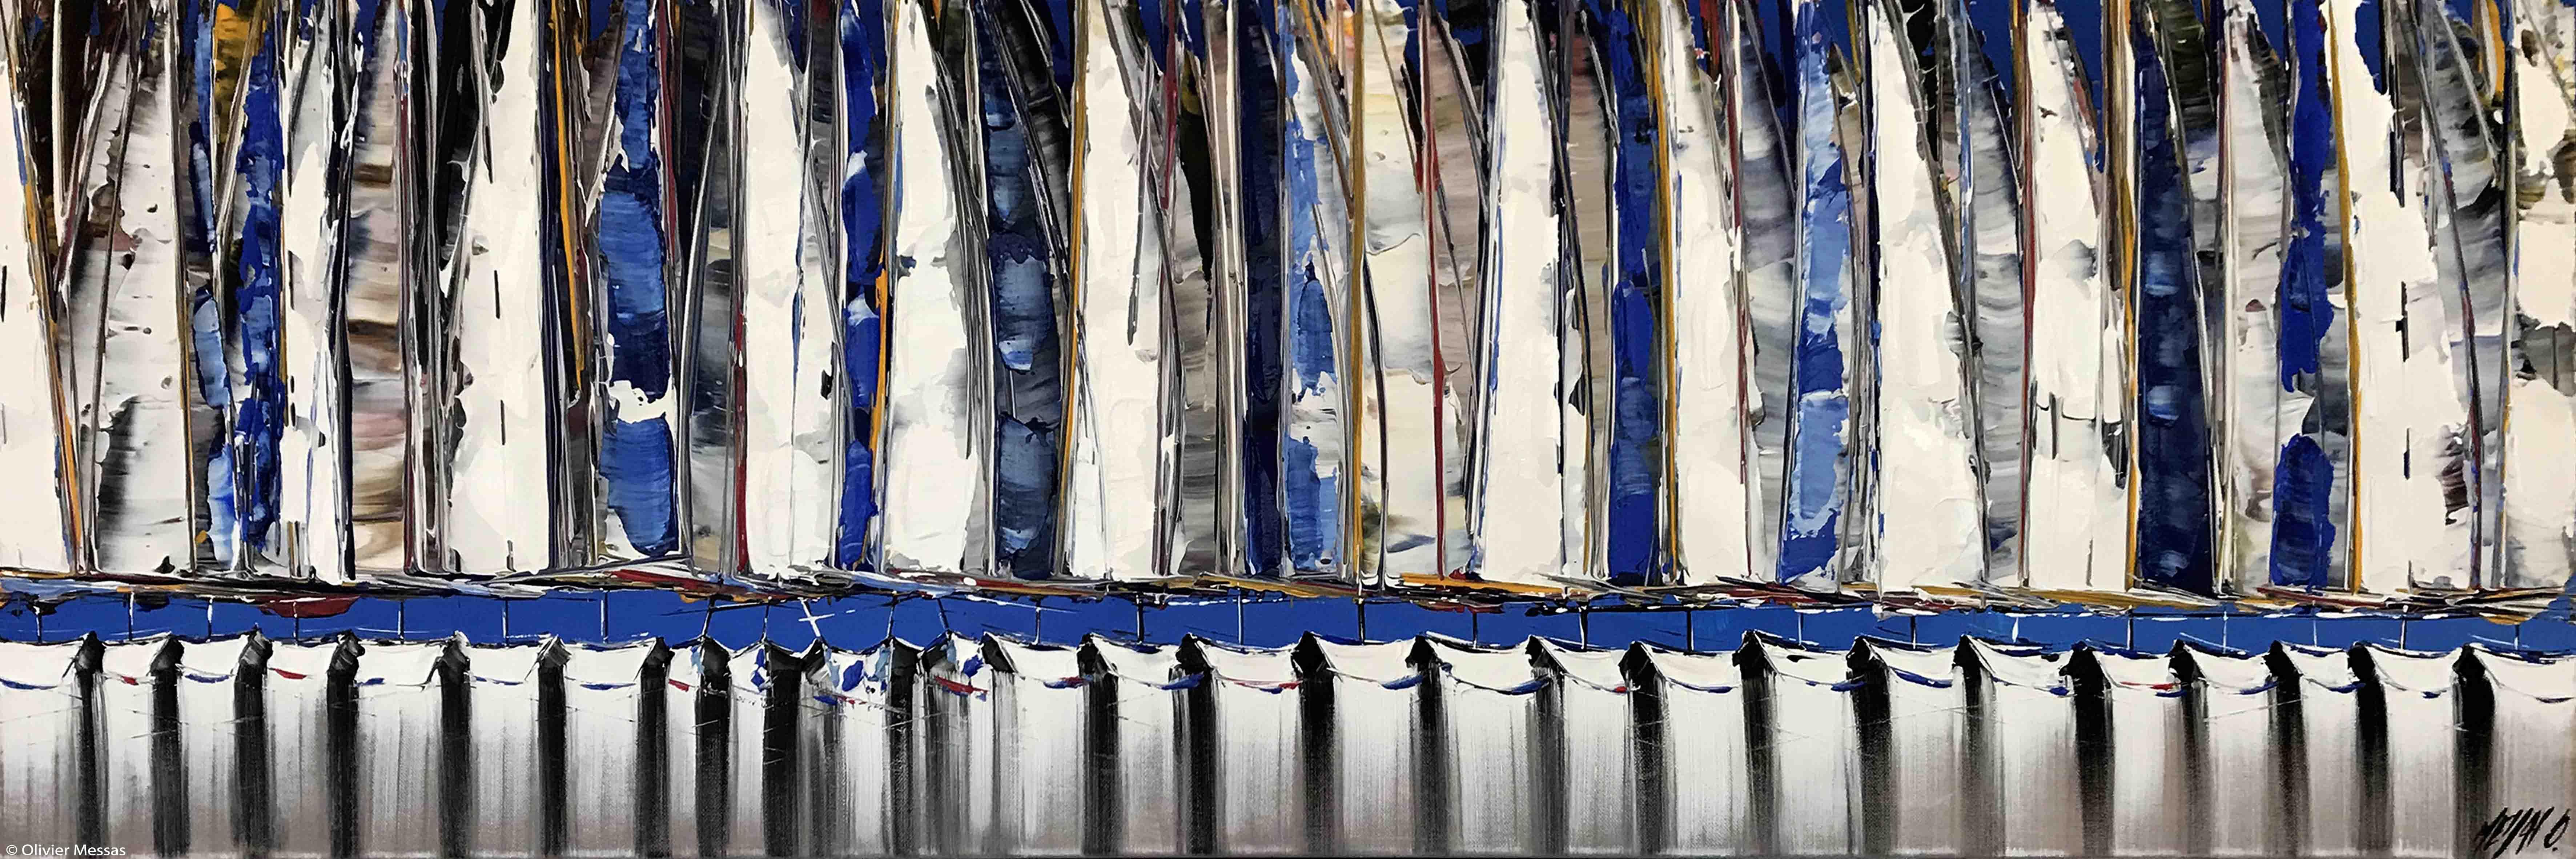 Les voiles bleus II, 40x120cm